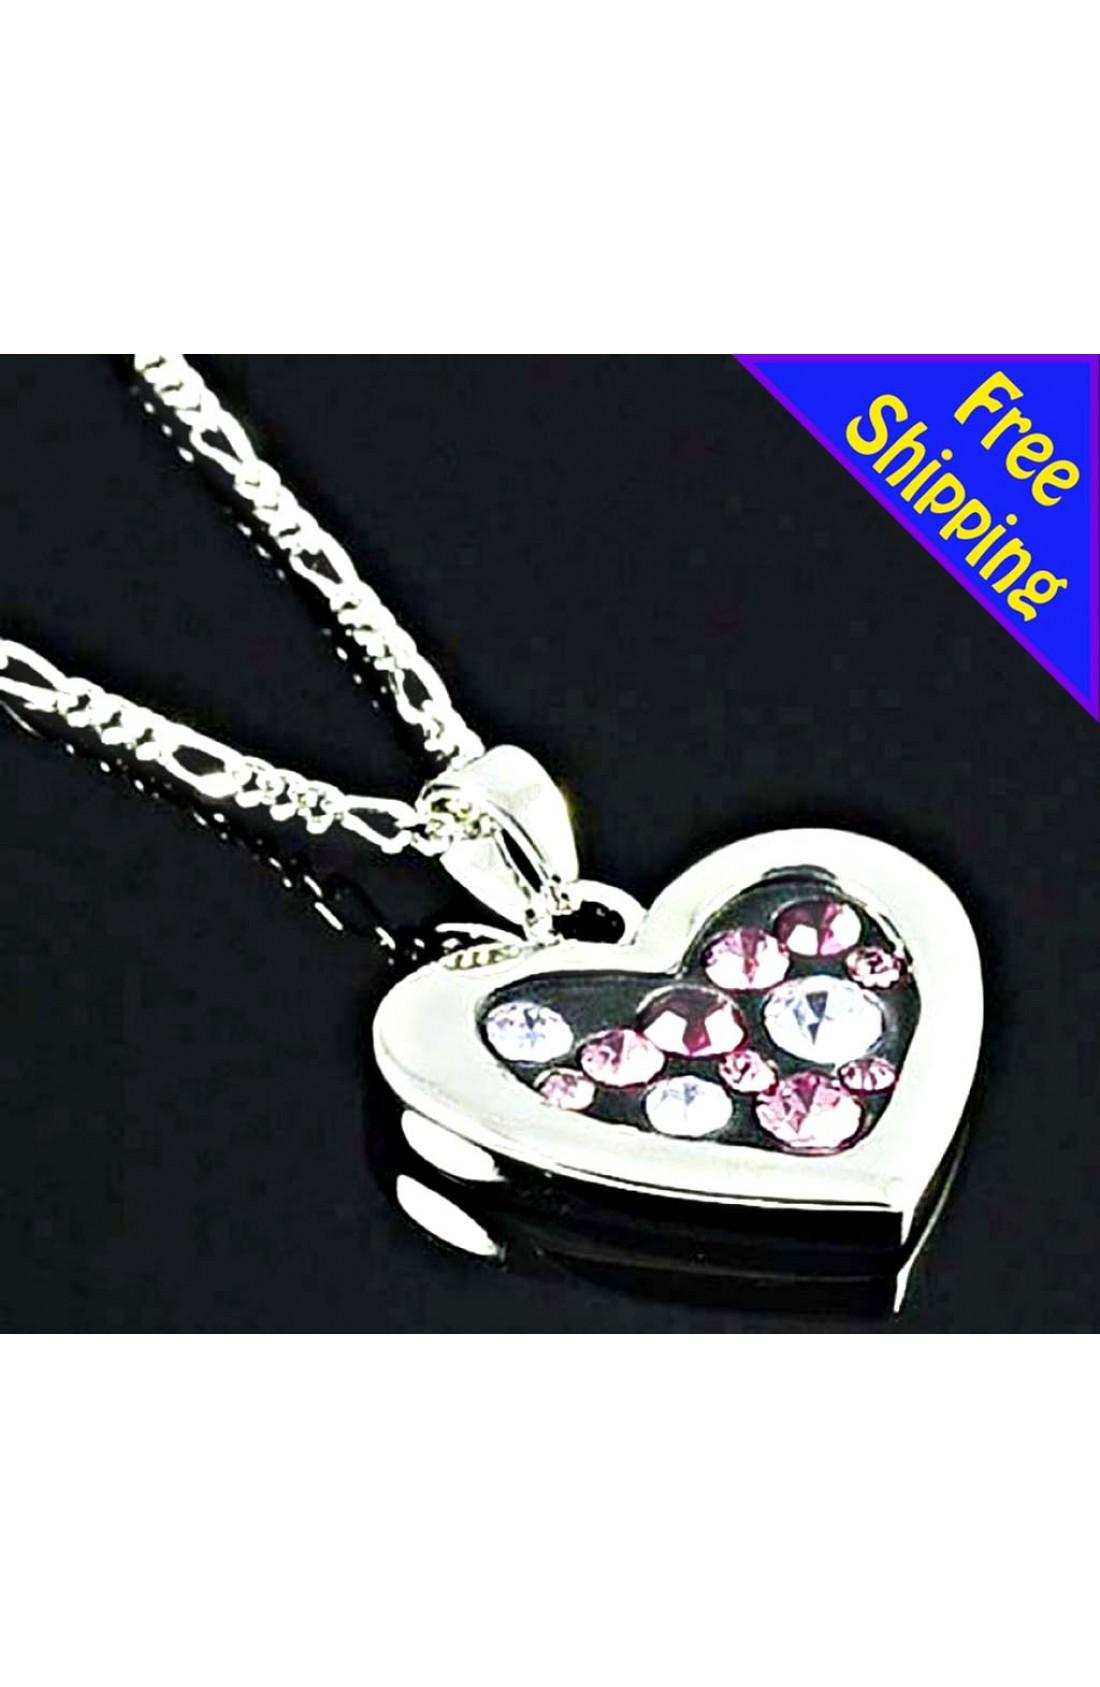 Imitation Rhodium Plated wit Heart Shaped full rhinestone Pendant Chain Necklace